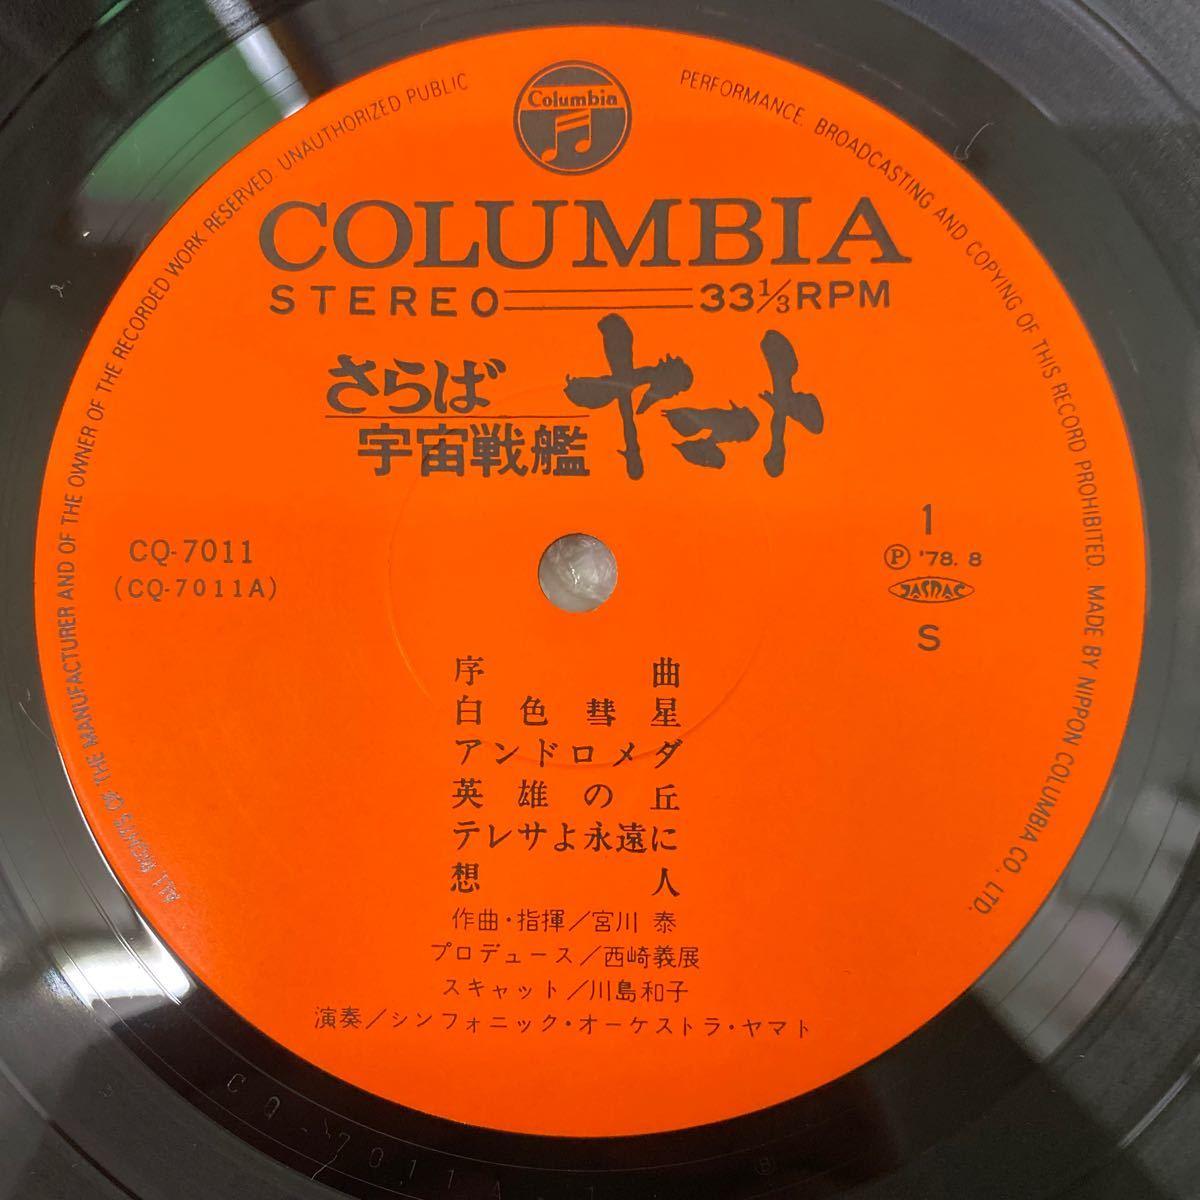 【LP】さらば宇宙戦艦ヤマト 愛の戦士たち 映画音楽集/オリジナルサウンドトラック(CQ-7011)日本コロムビア_画像7